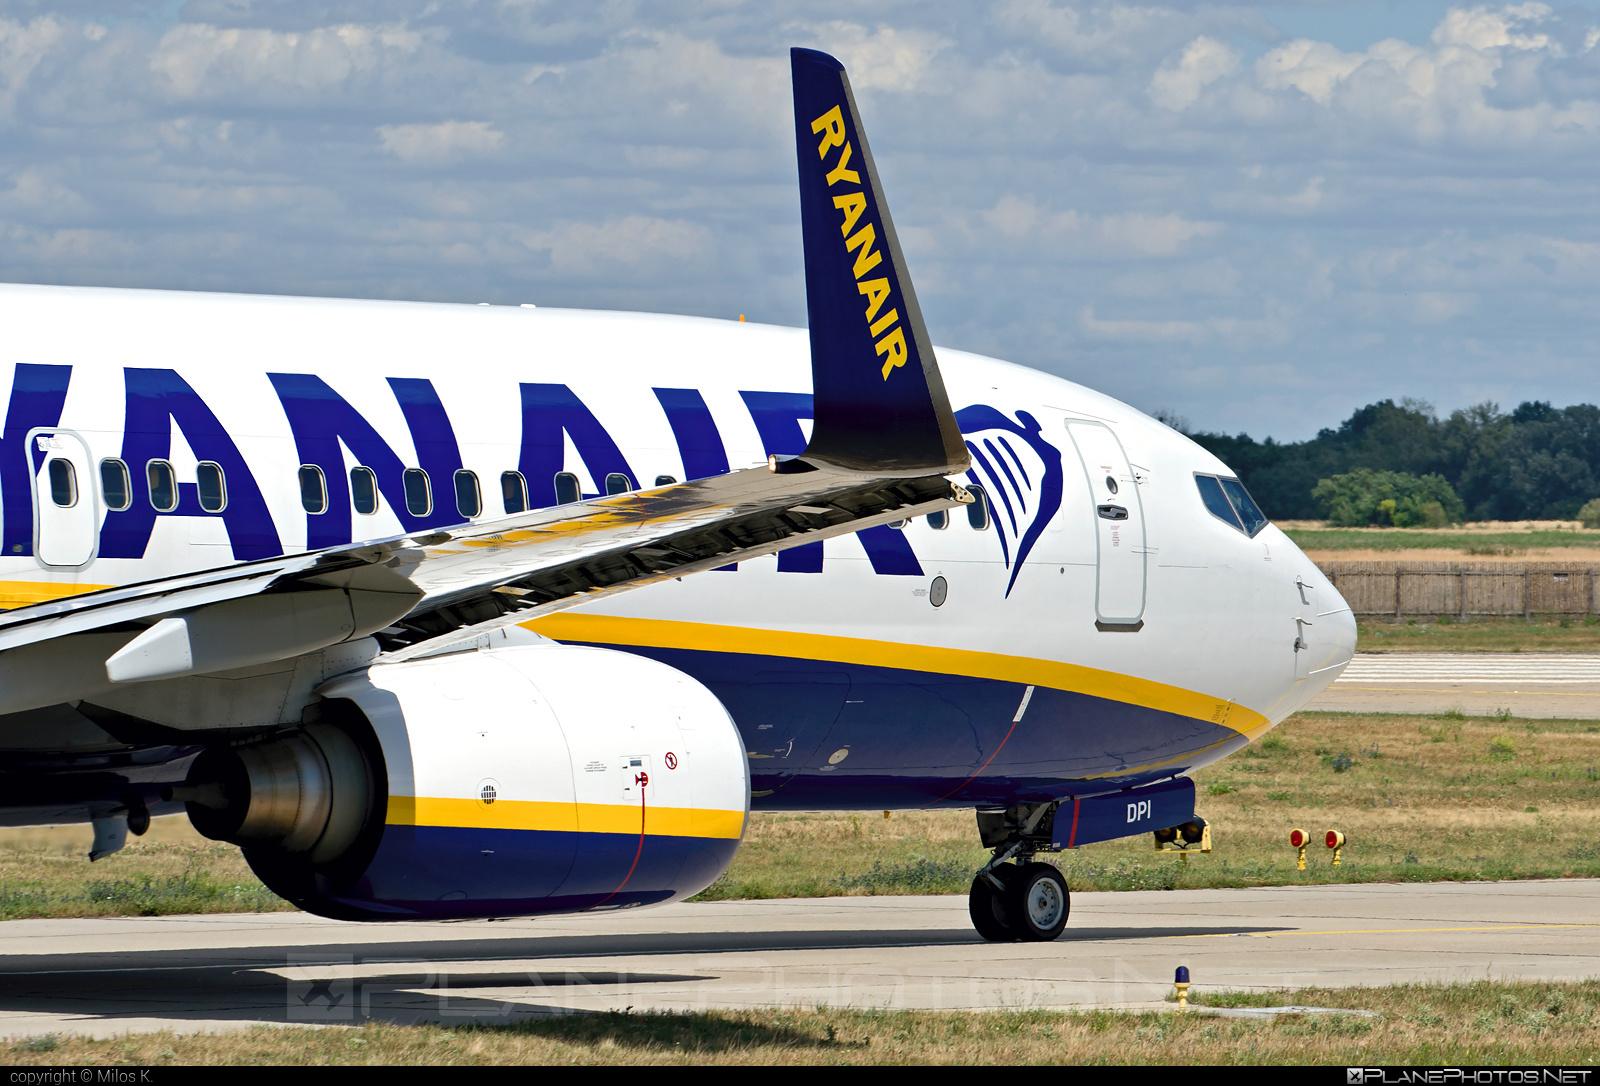 Boeing 737-800 - EI-DPI operated by Ryanair #b737 #b737nextgen #b737ng #boeing #boeing737 #ryanair